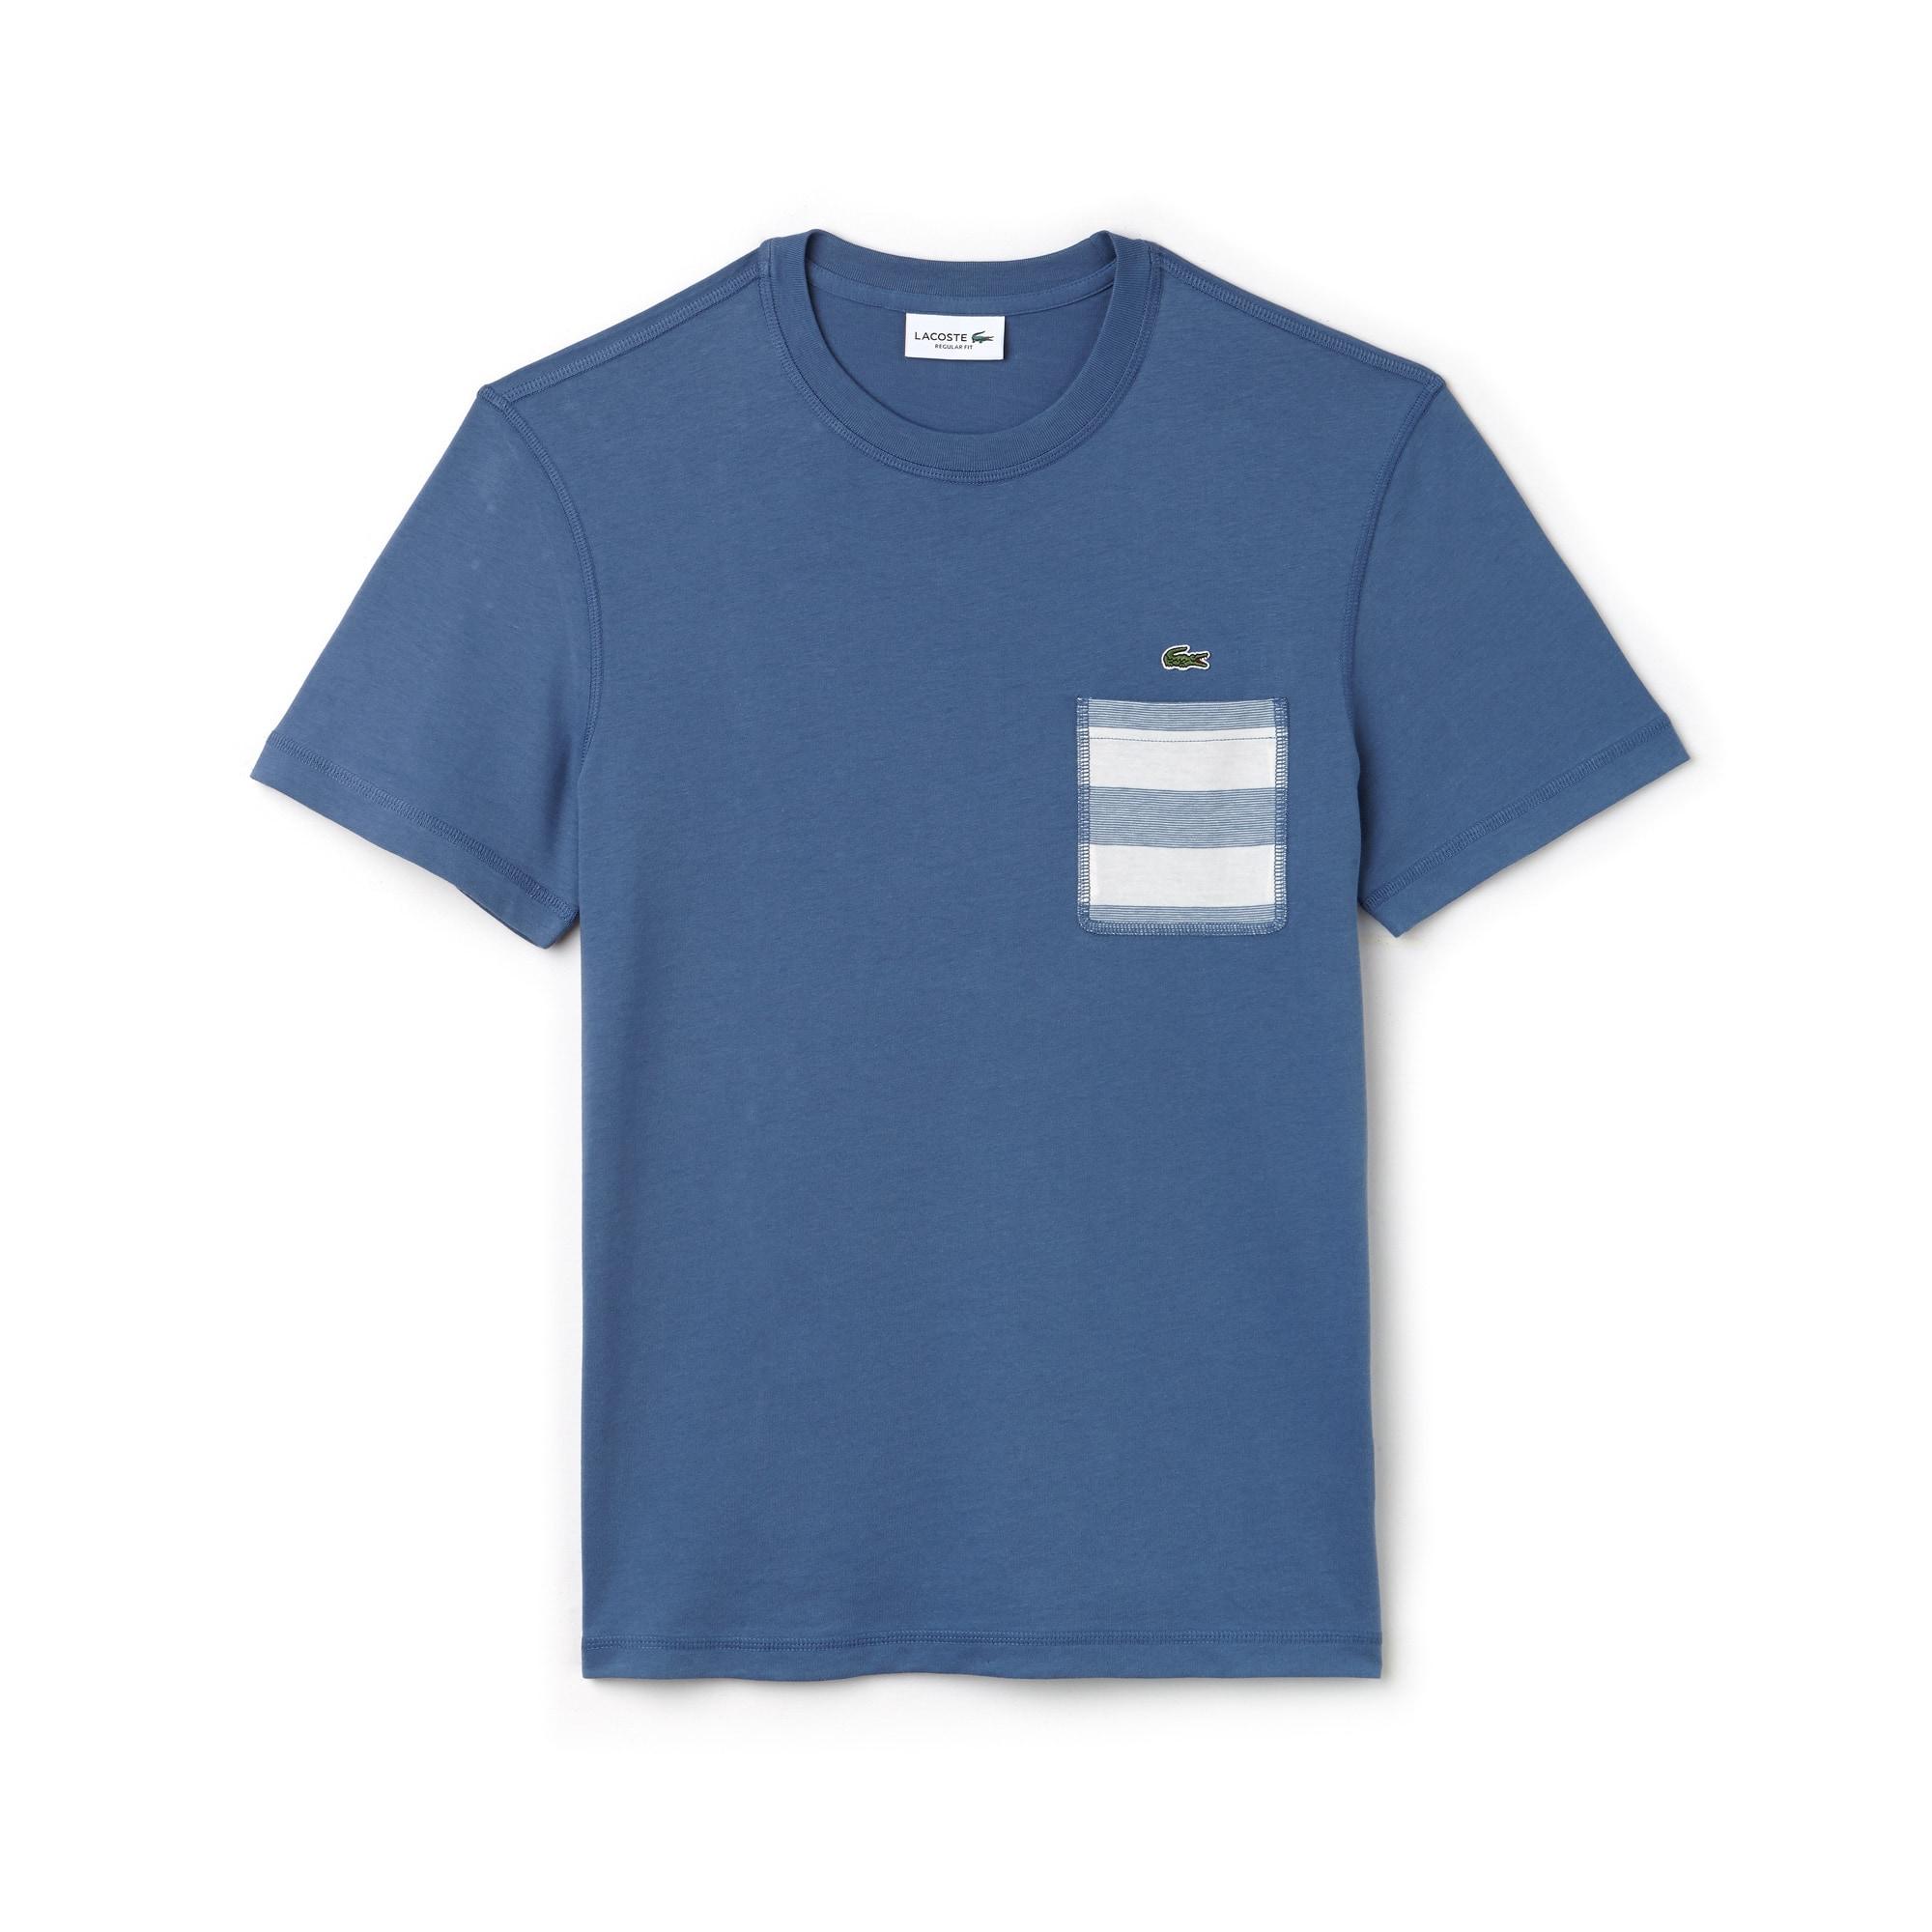 Men's Striped Pocket Cotton T-Shirt